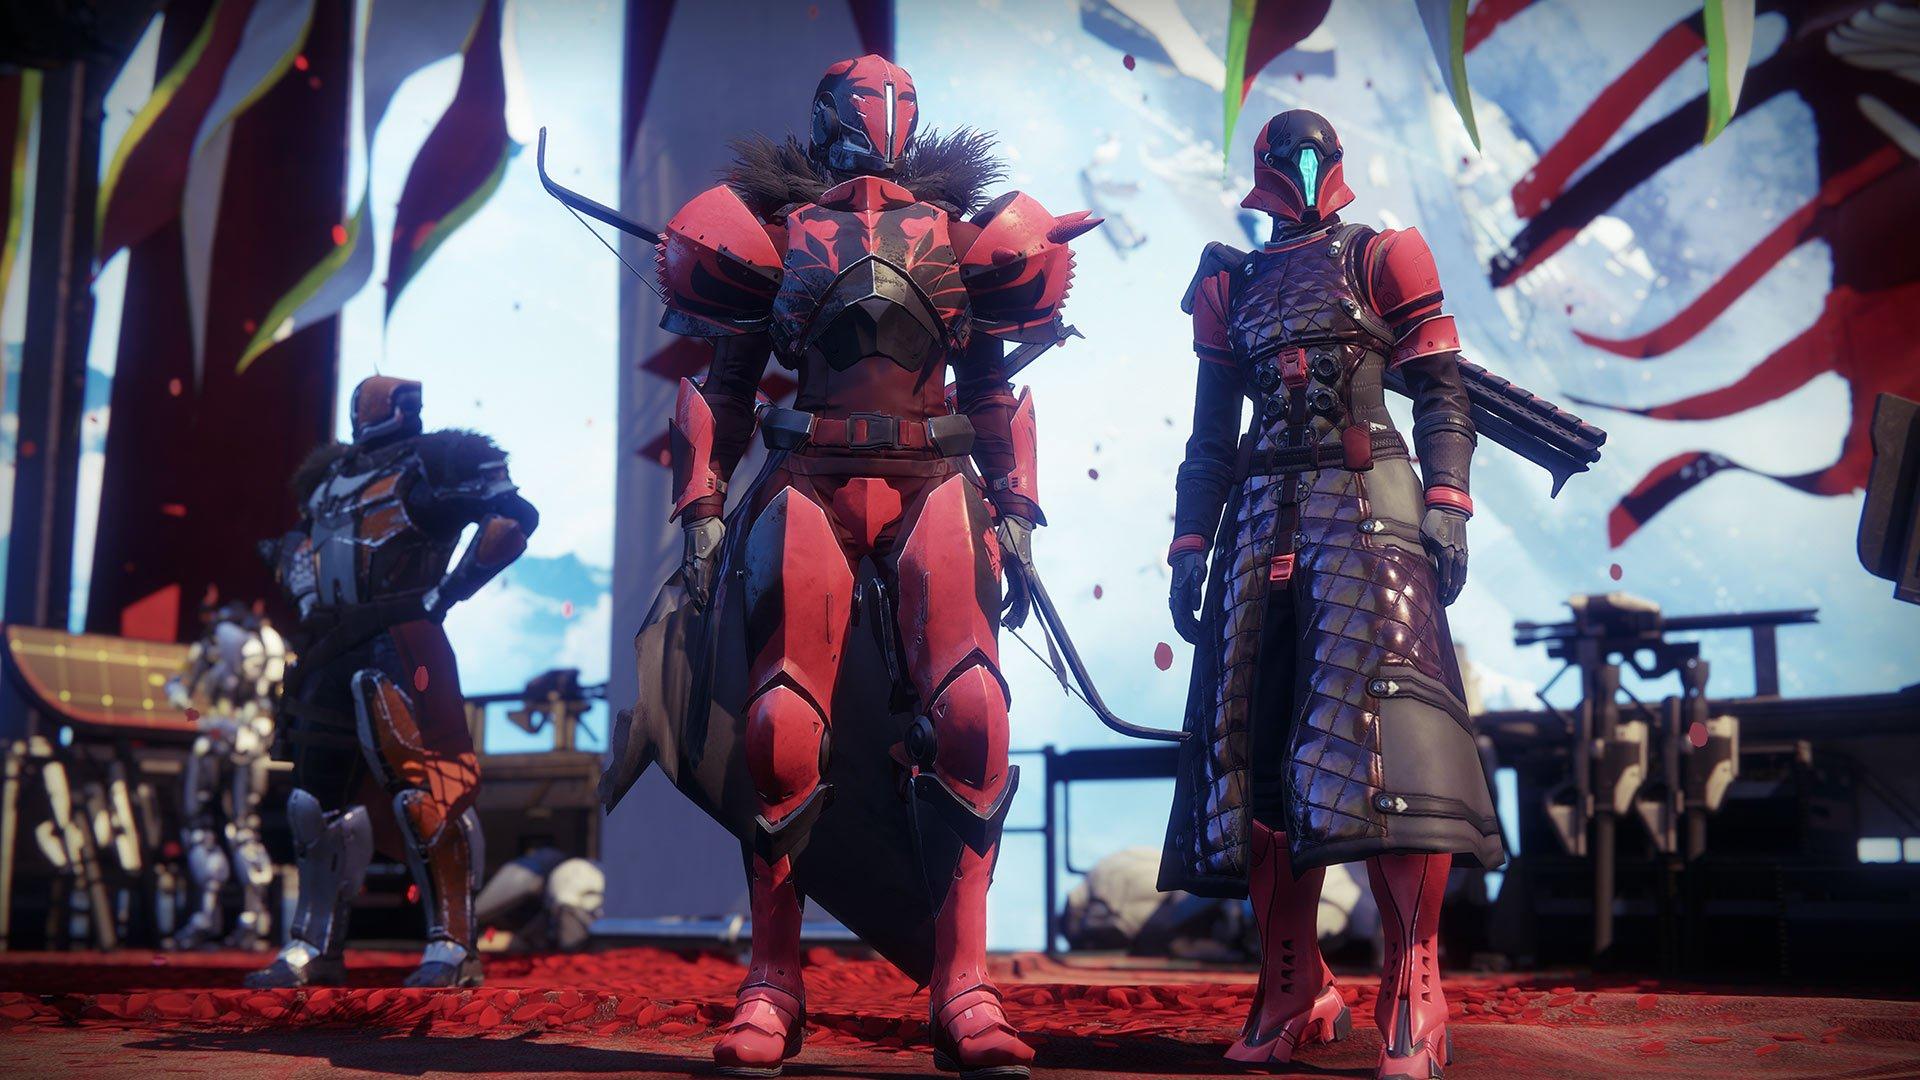 destiny 2 crimson days start date end date